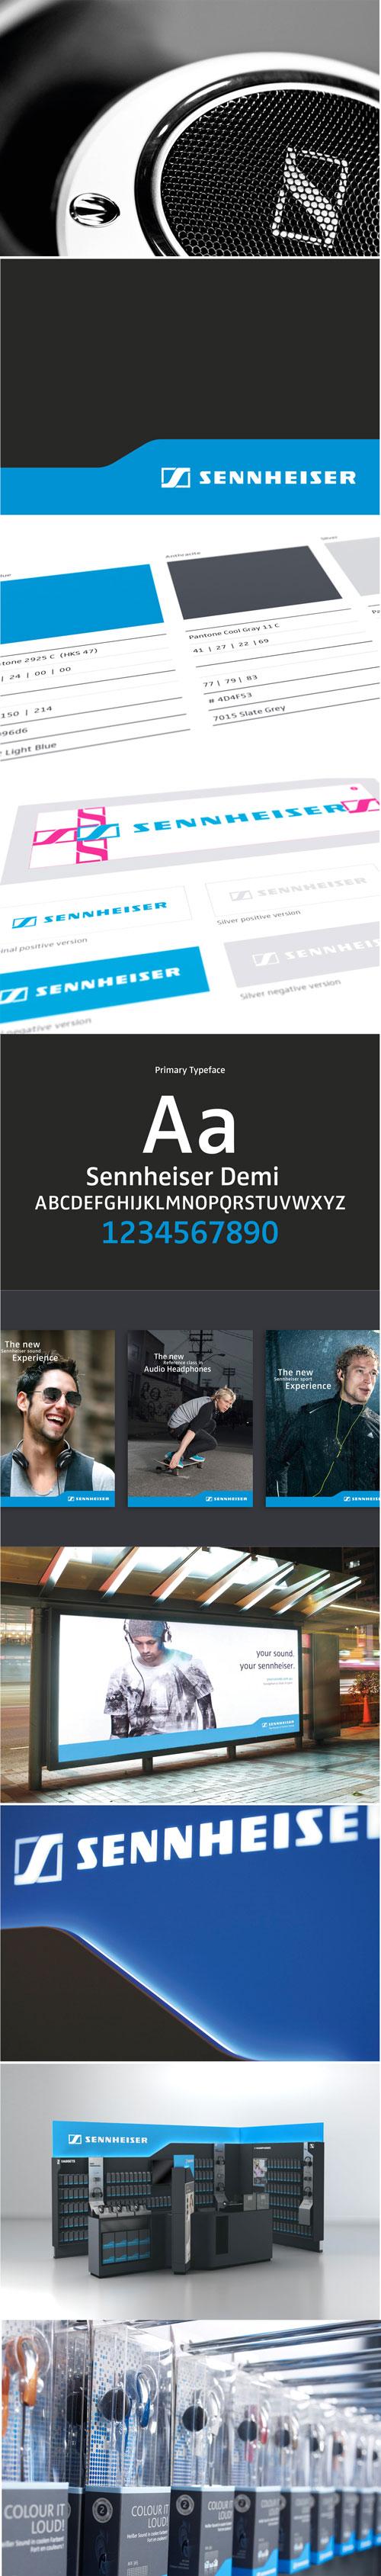 Sennheiser_Corporate Design_by SYNDICATE DESIGN AG #brand #Corporate #design #hifi #Syndicate